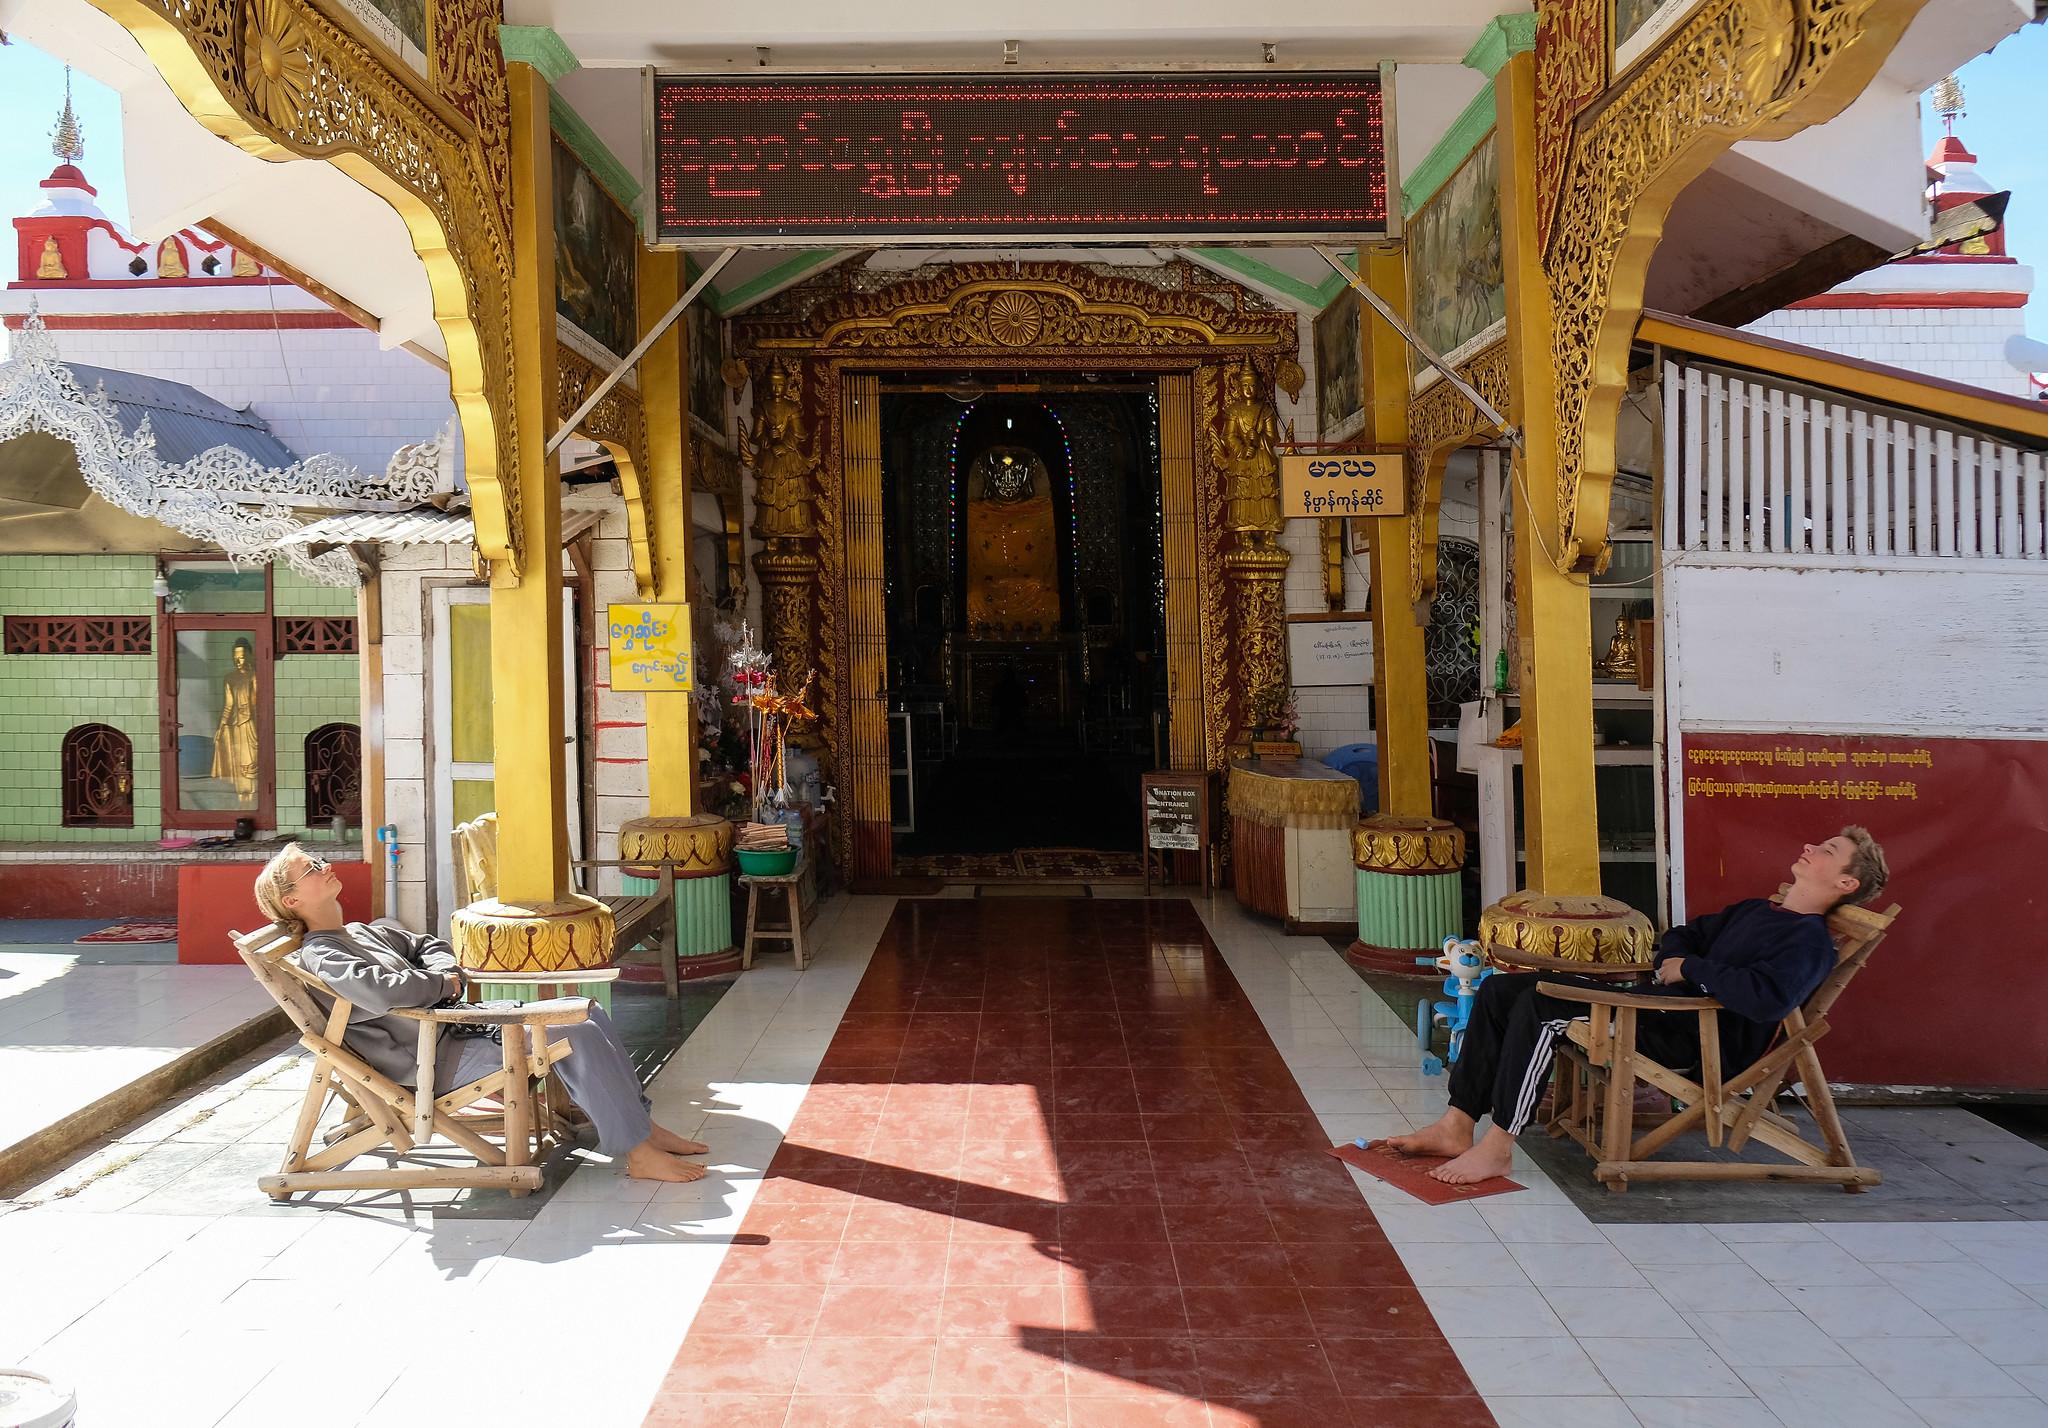 templewaechter